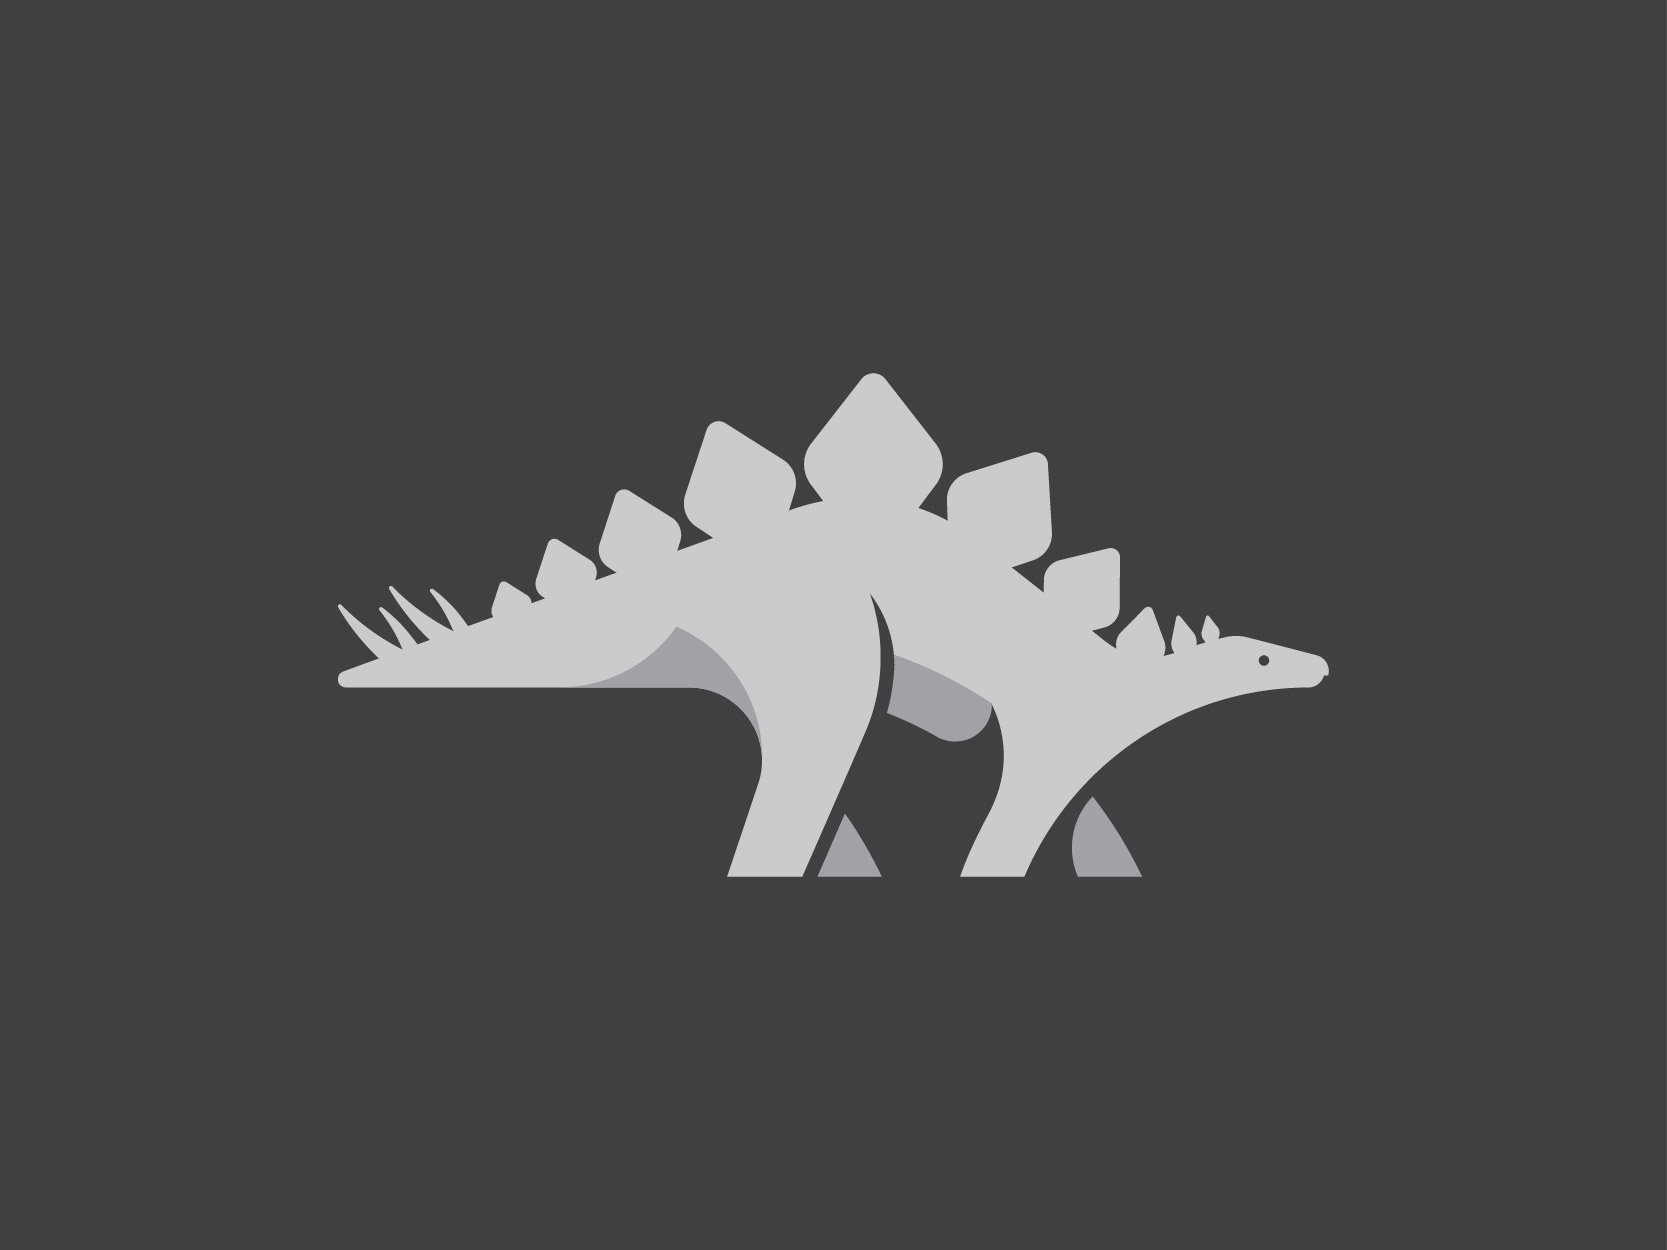 48 stegosaurus